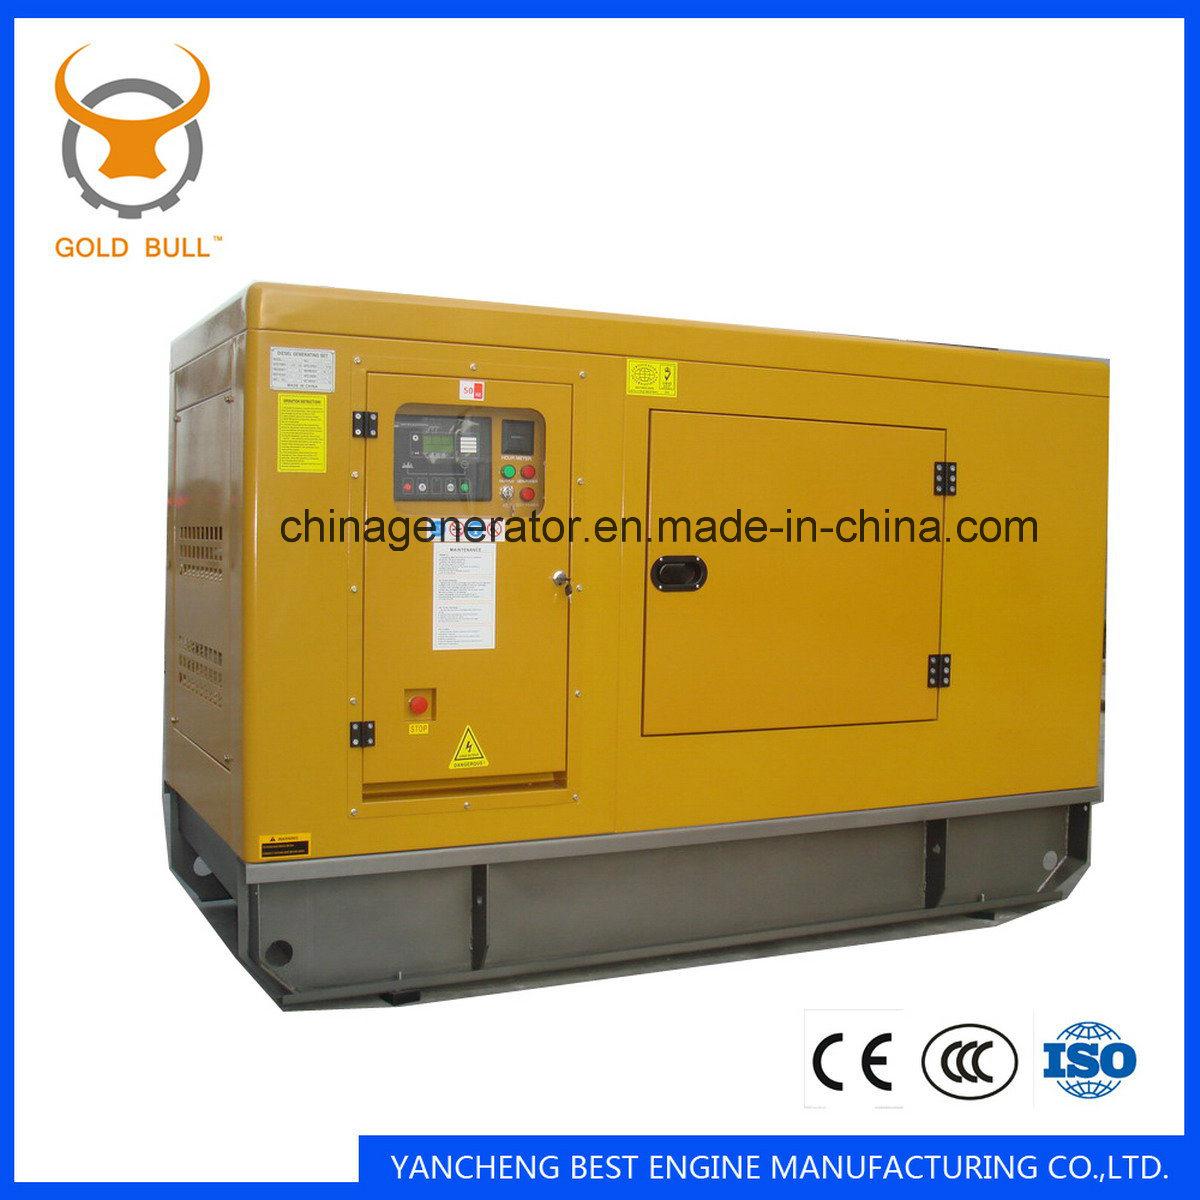 20kw-120kw Silent UK Power Generator by Best Engine